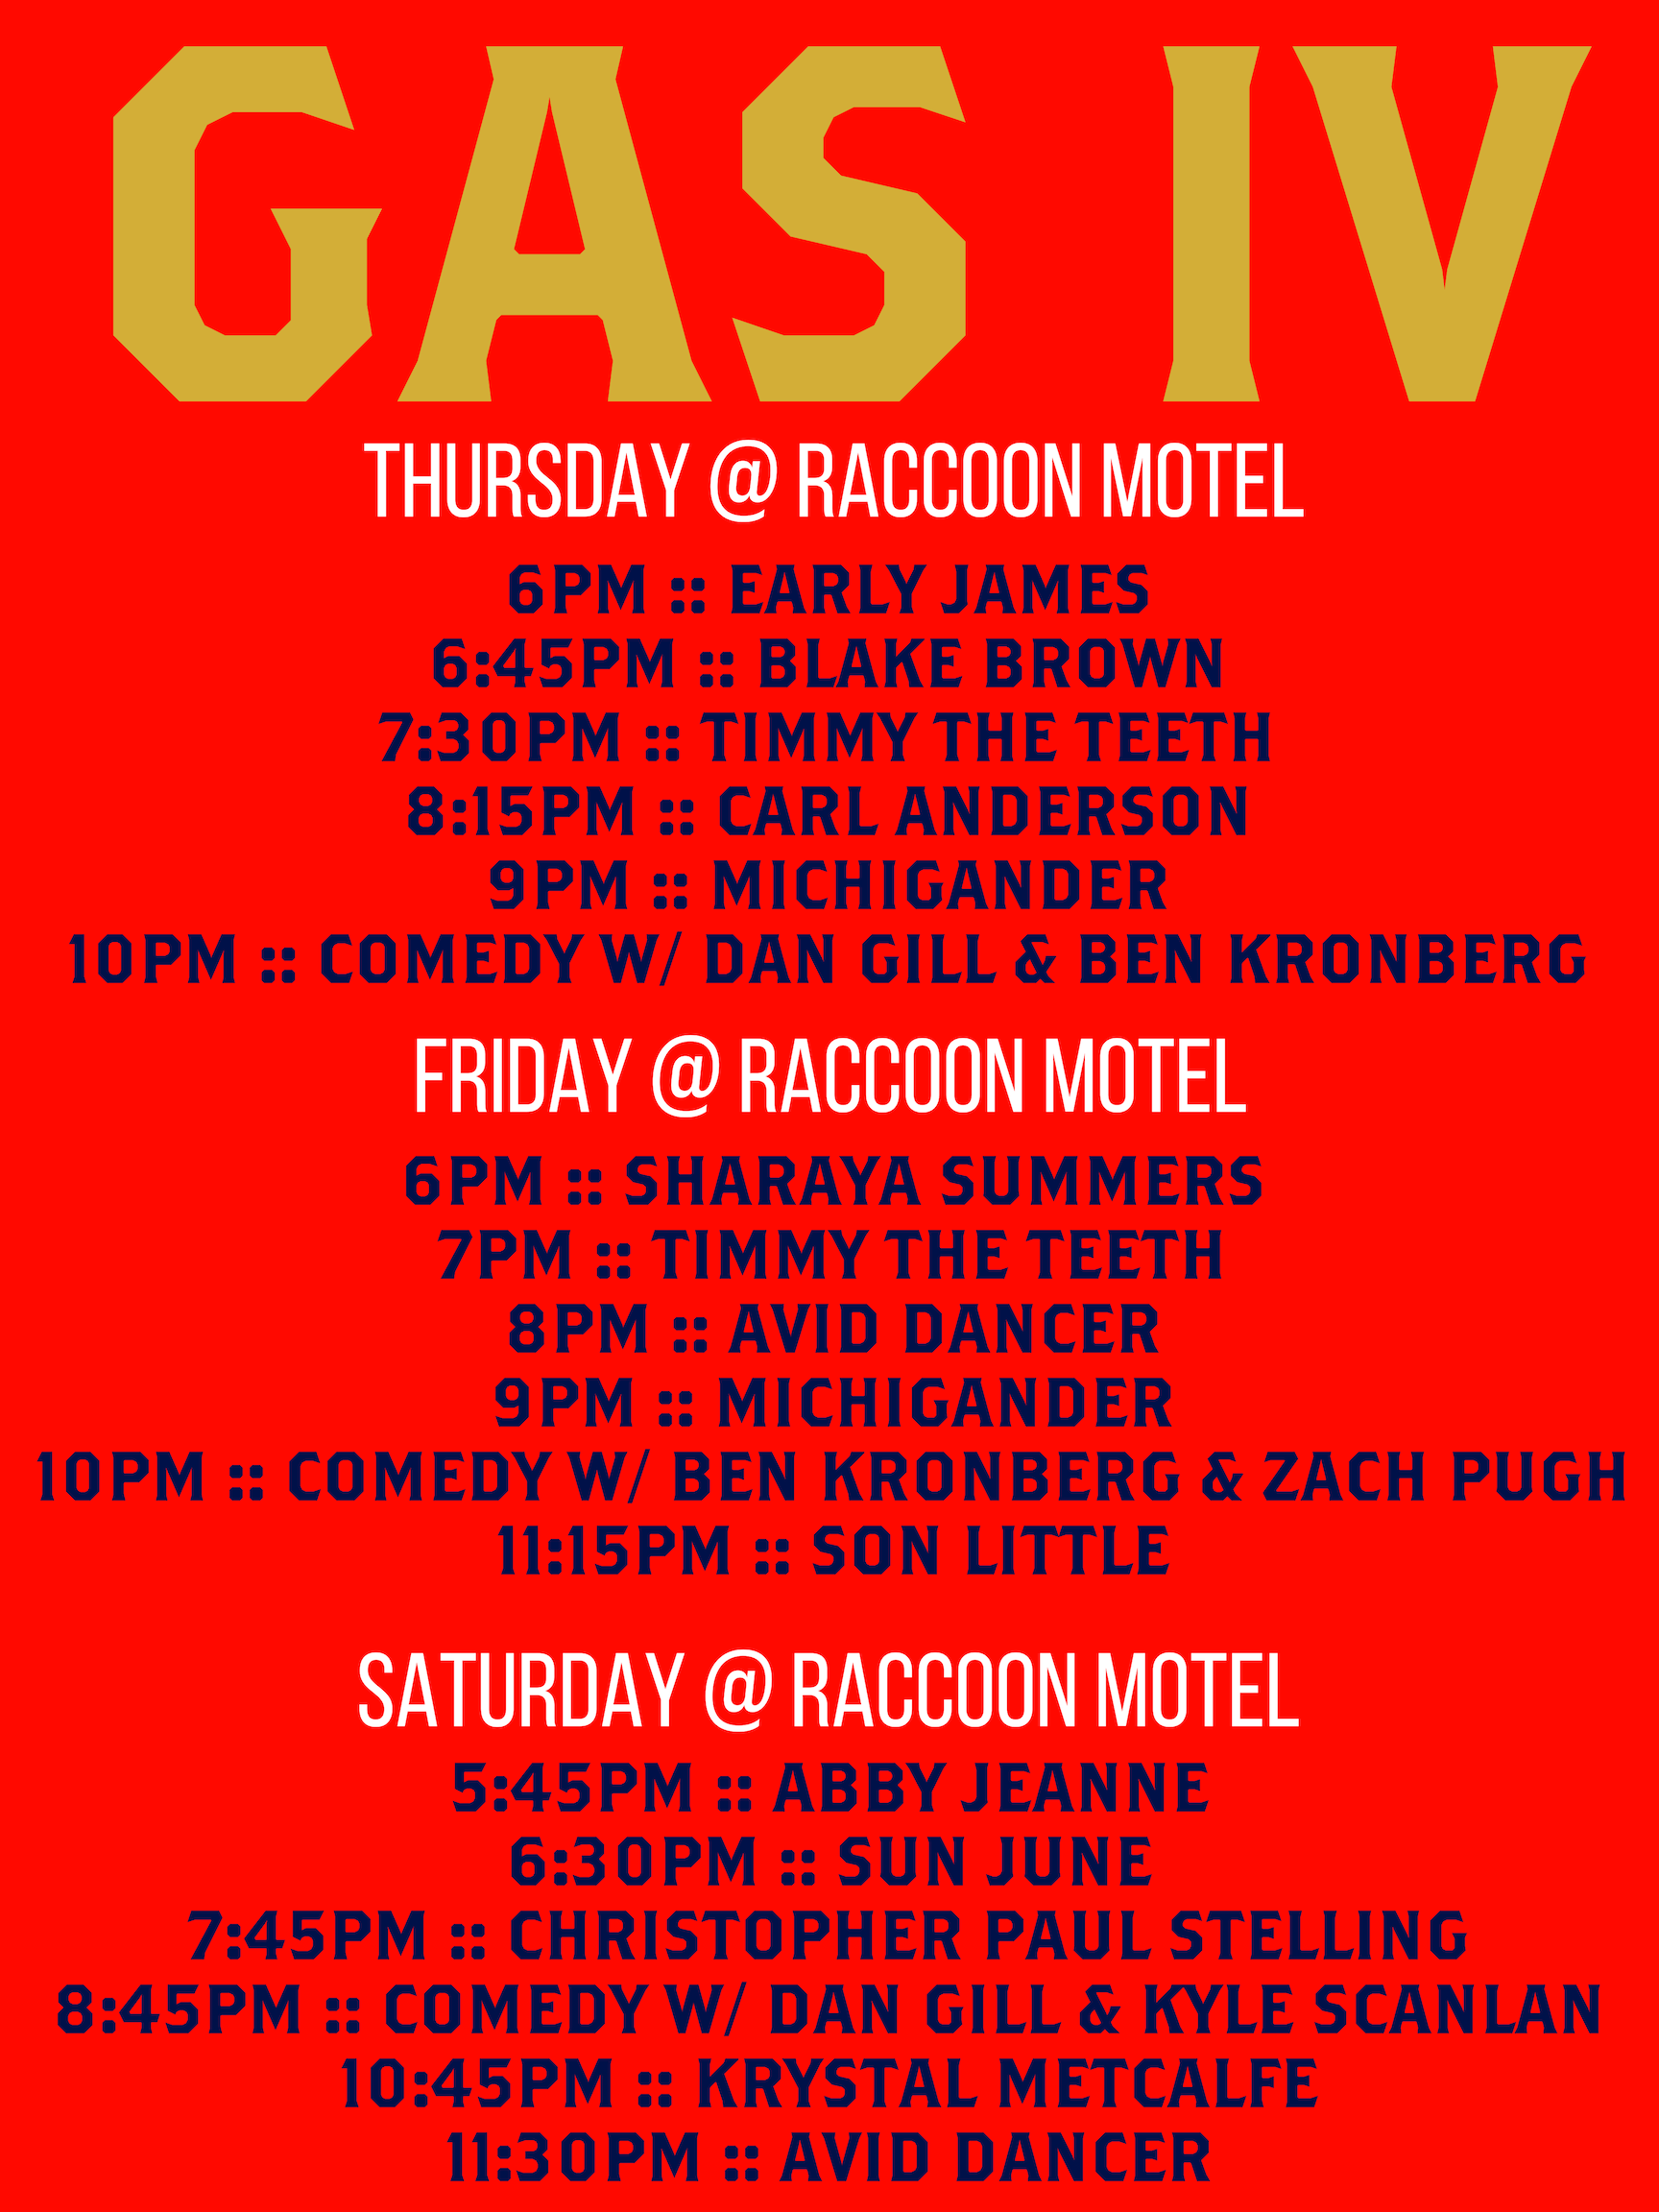 GAS IV Raccoon Schedule.png